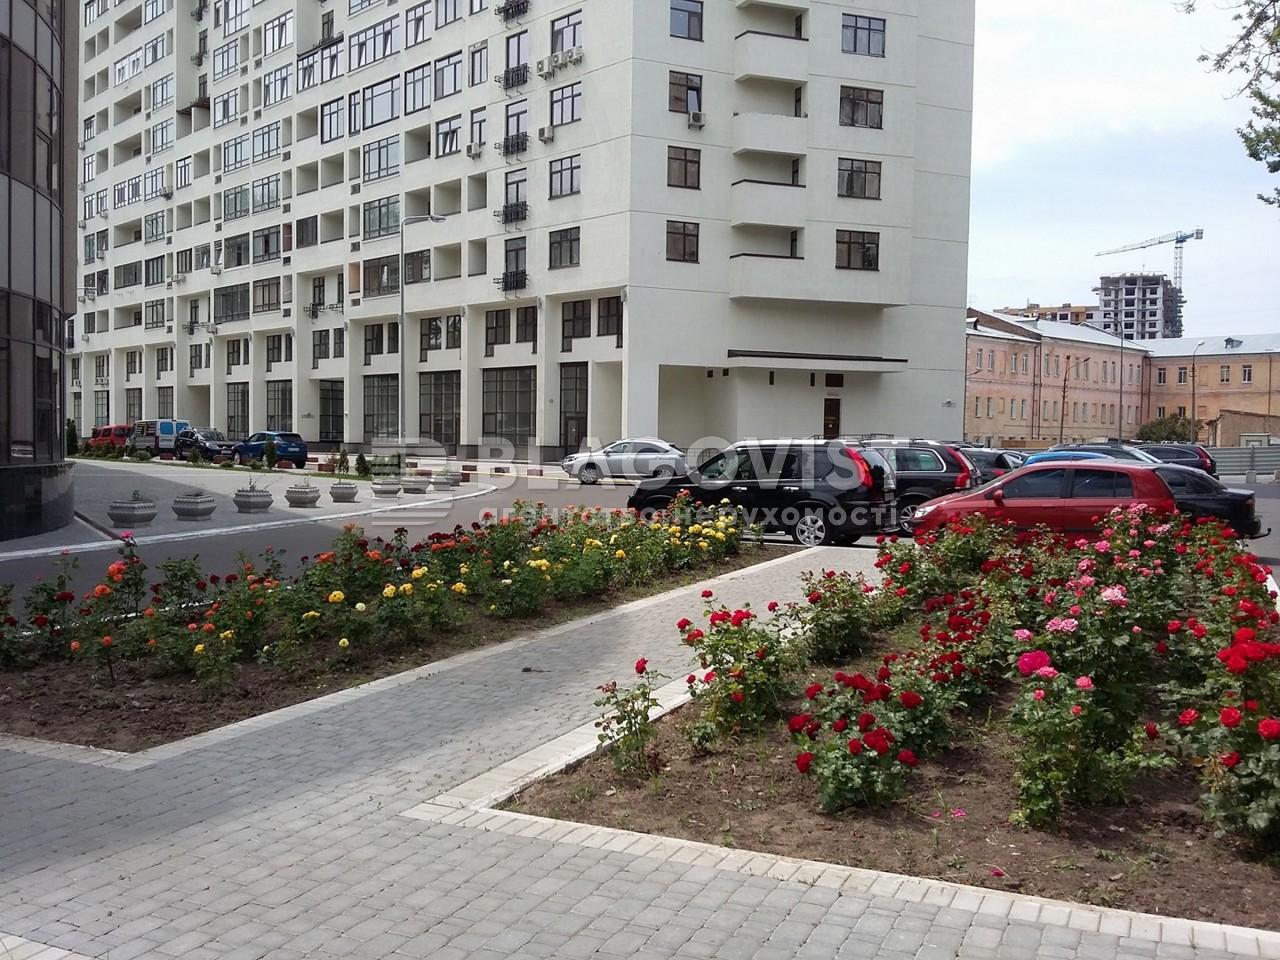 Нежитлове приміщення, H-34510, Коновальця Євгена (Щорса), Київ - Фото 11